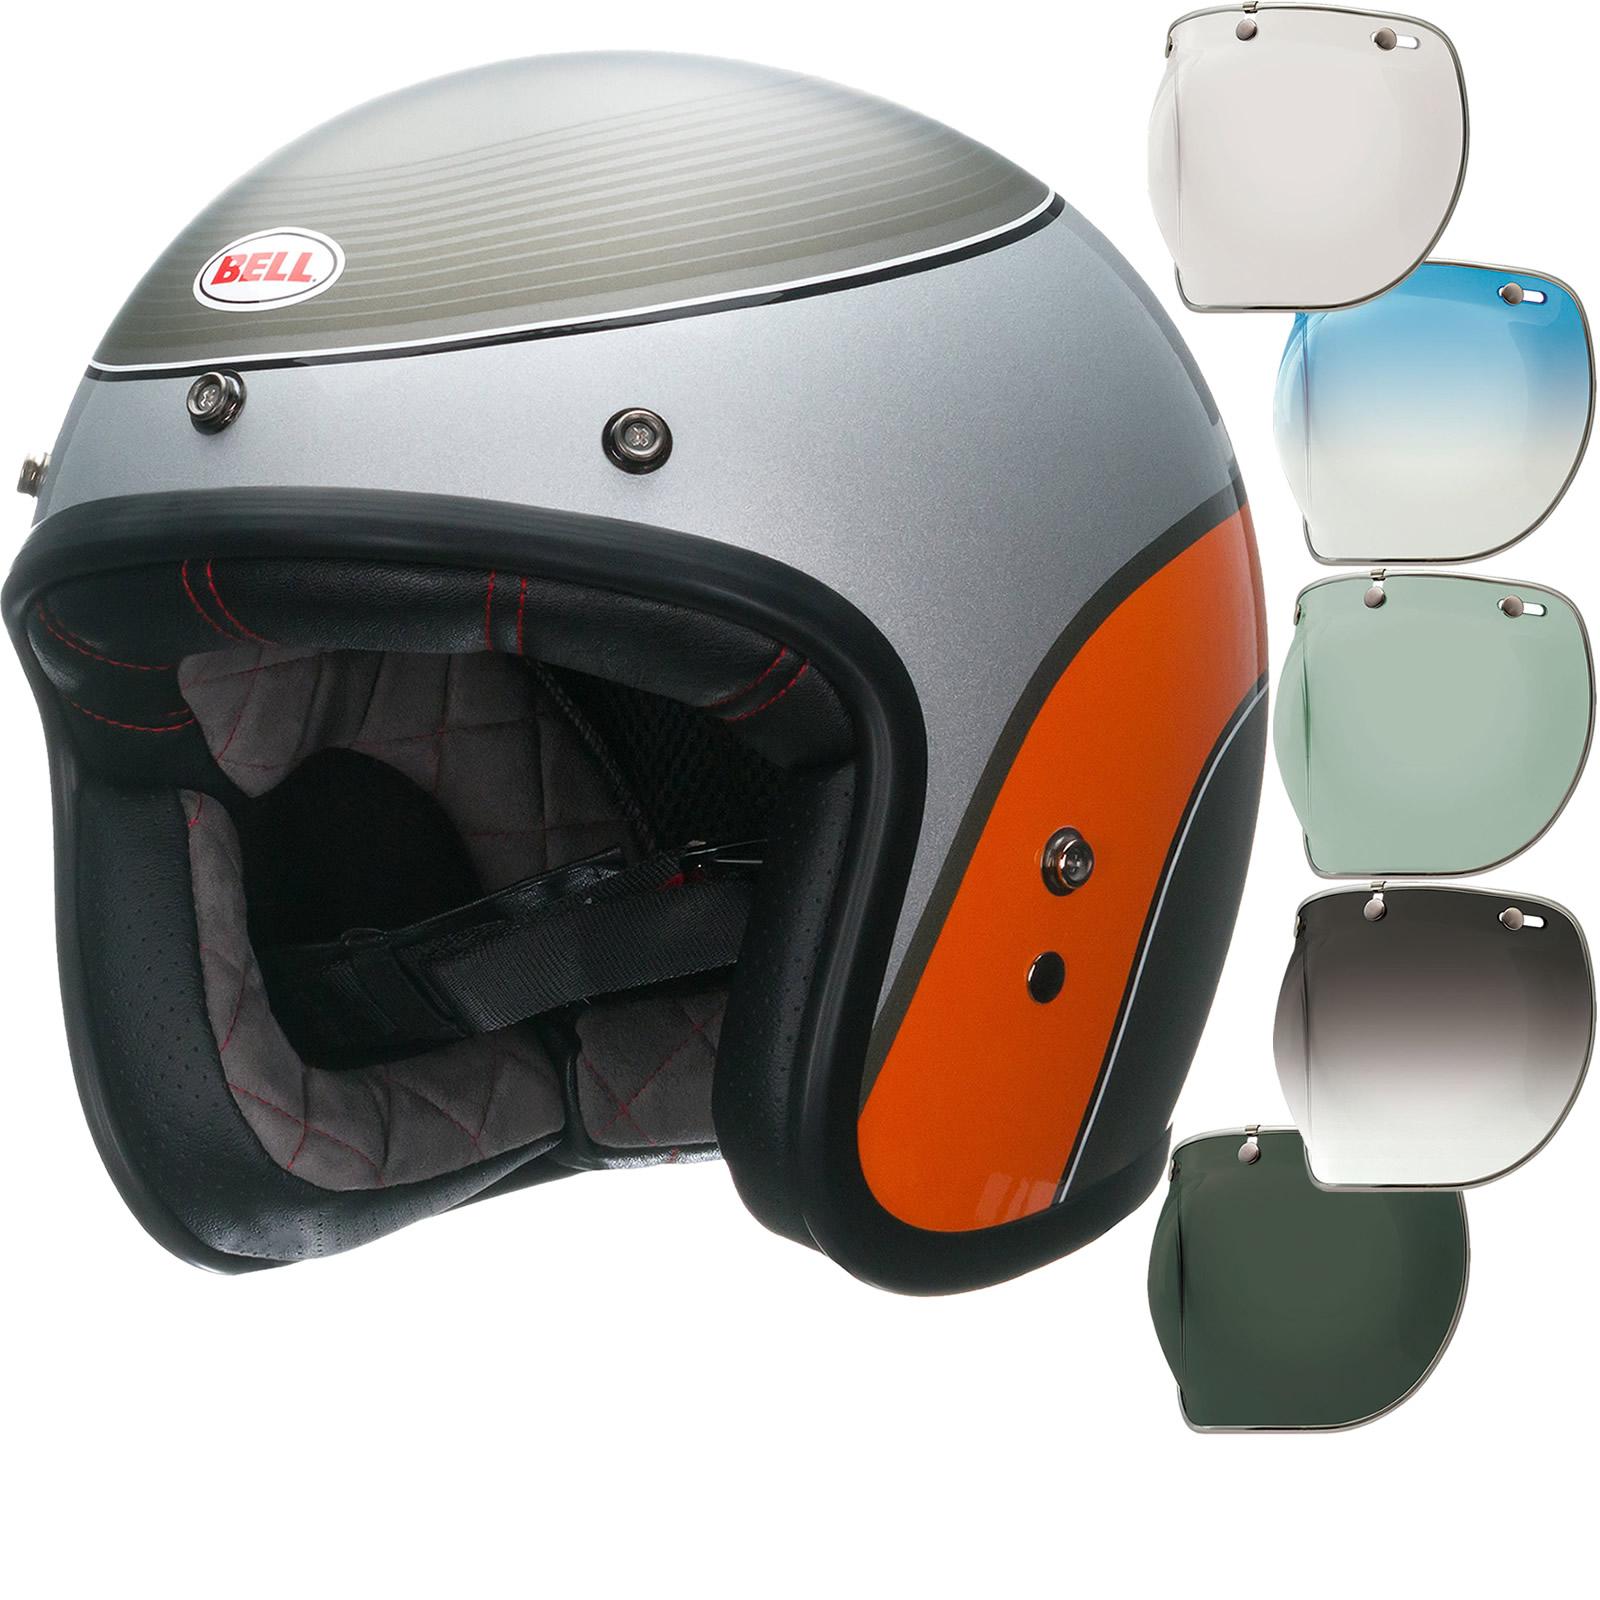 Bell Custom 500 Bubble Visor >> Bell Custom 500 SE Airtrix Delinquent Open Face Motorcycle Helmet & Optional Bubble Deluxe Visor ...